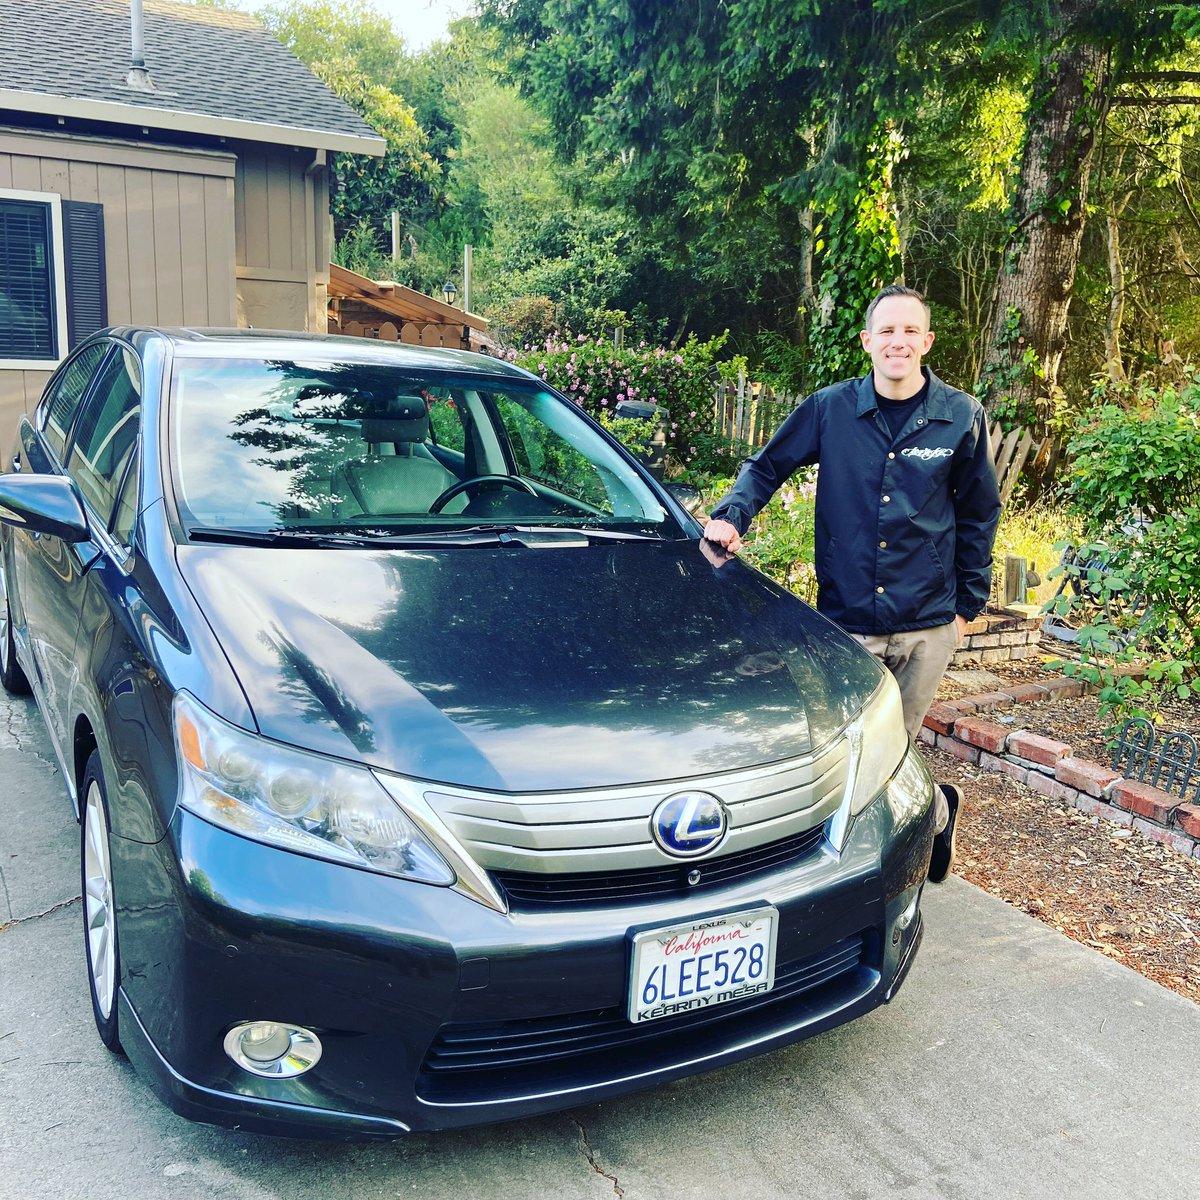 Finally got my car. So happy https://t.co/QJGPf52EHN